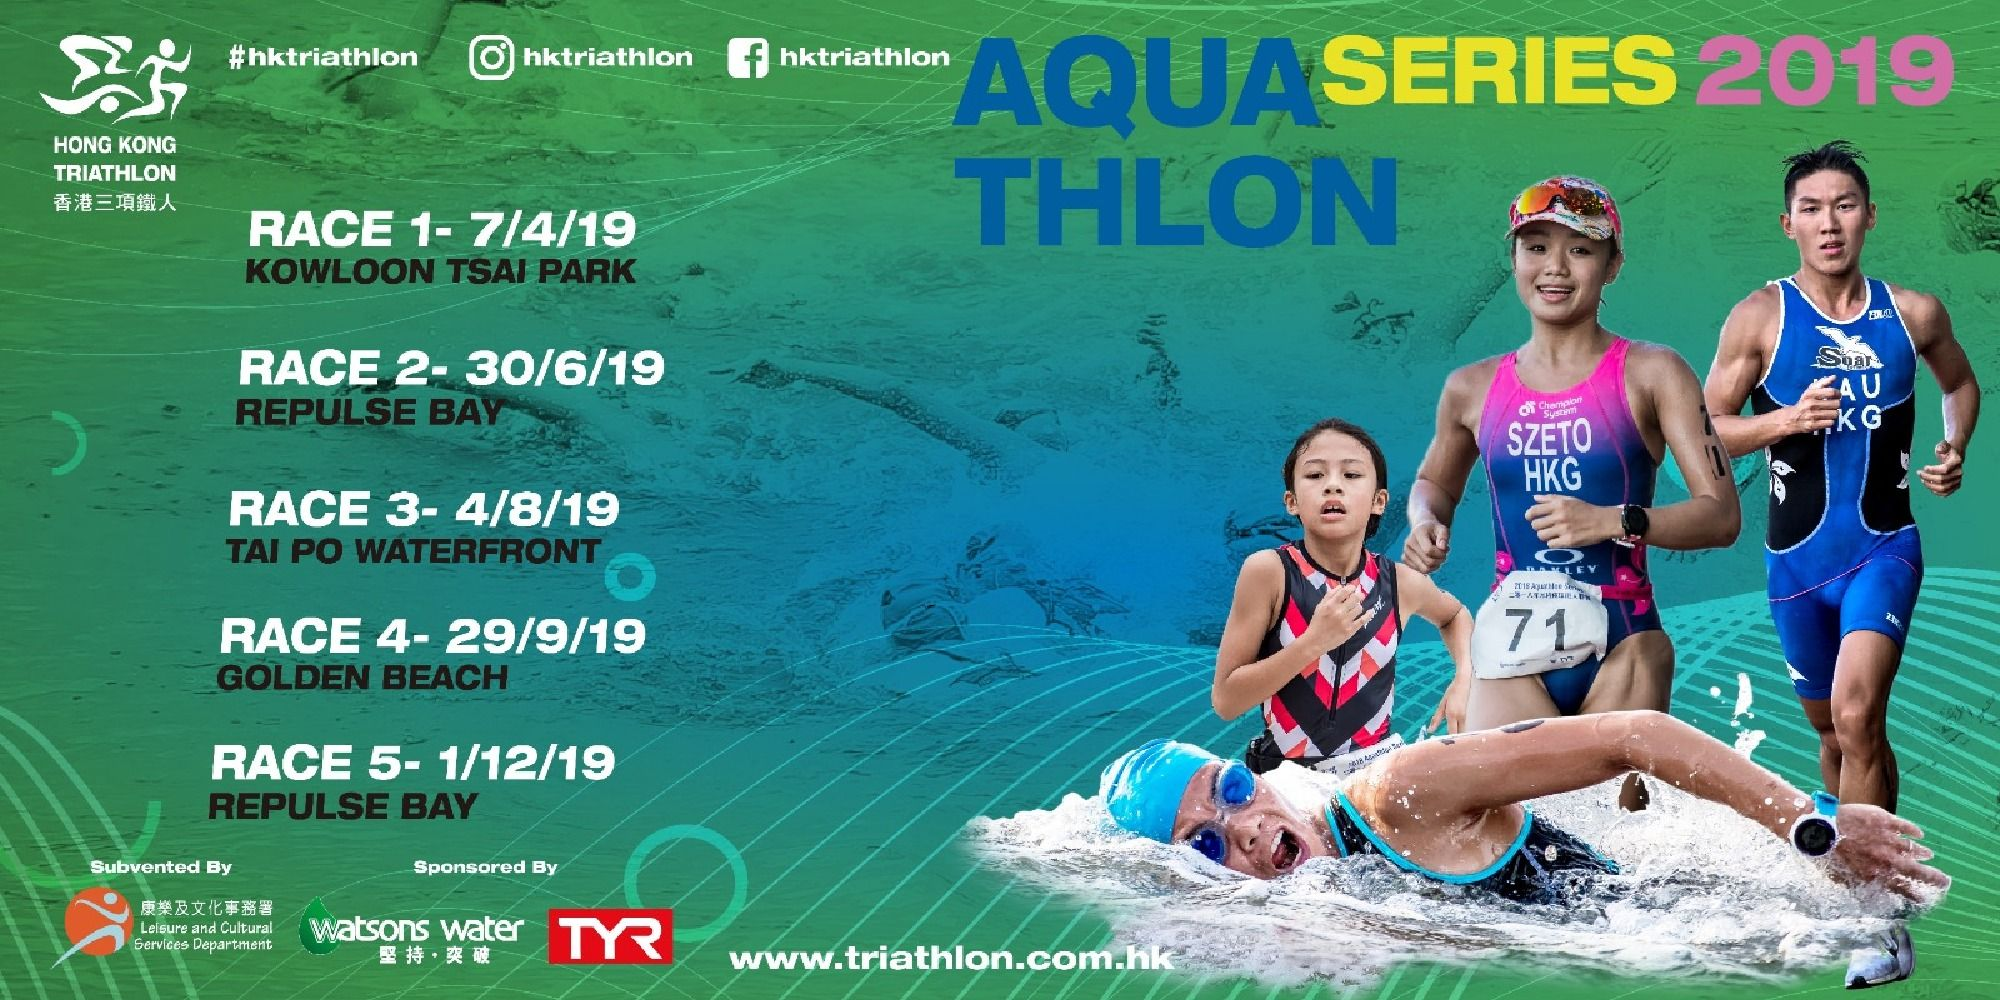 2019 Aquathlon Series – Race 5 二零一九年水陸兩項鐵人賽 - 比賽5